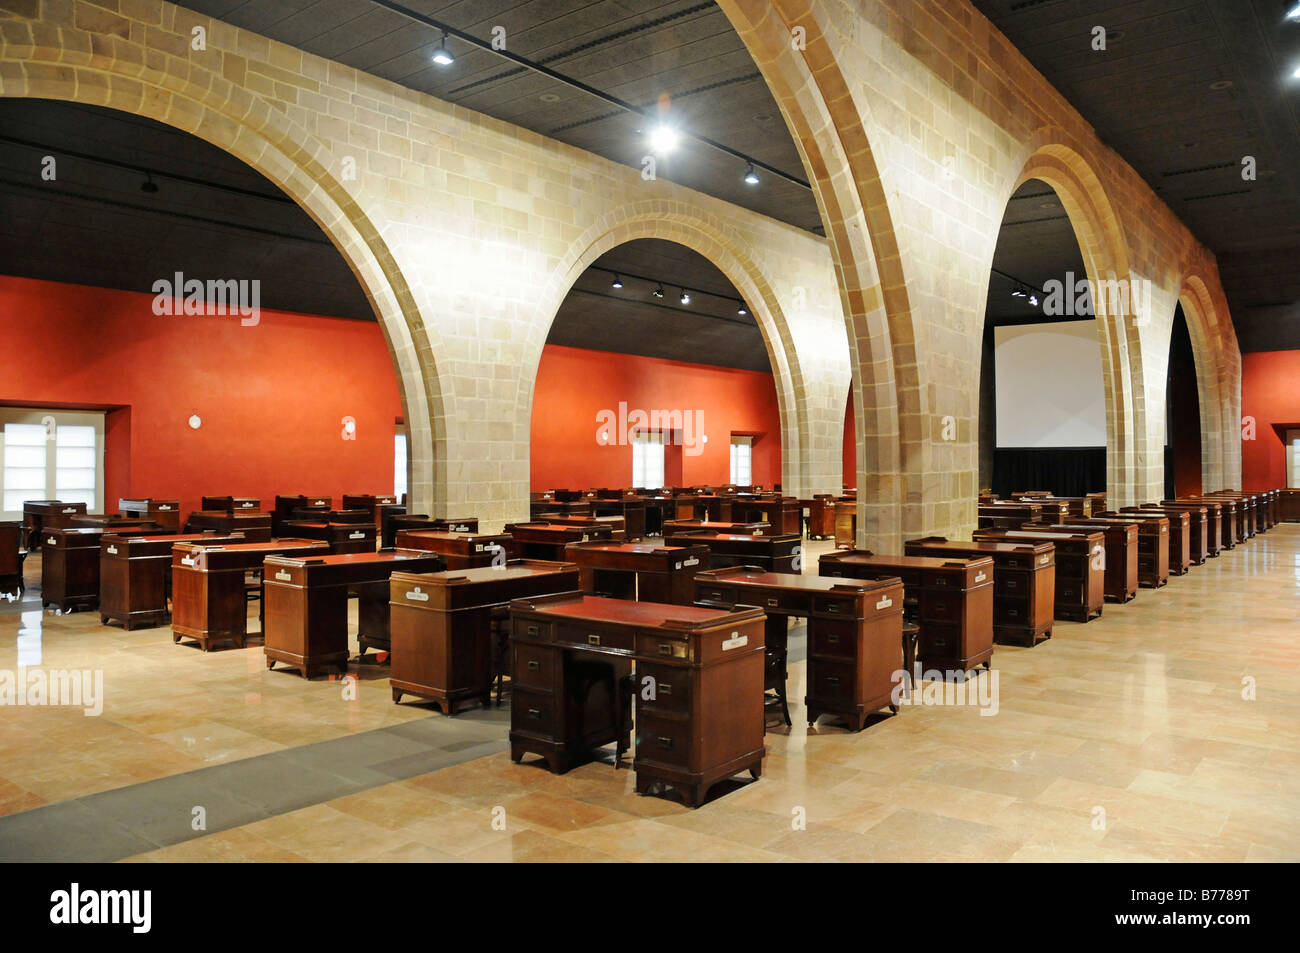 Bureaus, parlour, hall, Palacio de la Llotja de Mar, former stock exchange, Barcelona, Catalonia, Spain, Europe Stock Photo